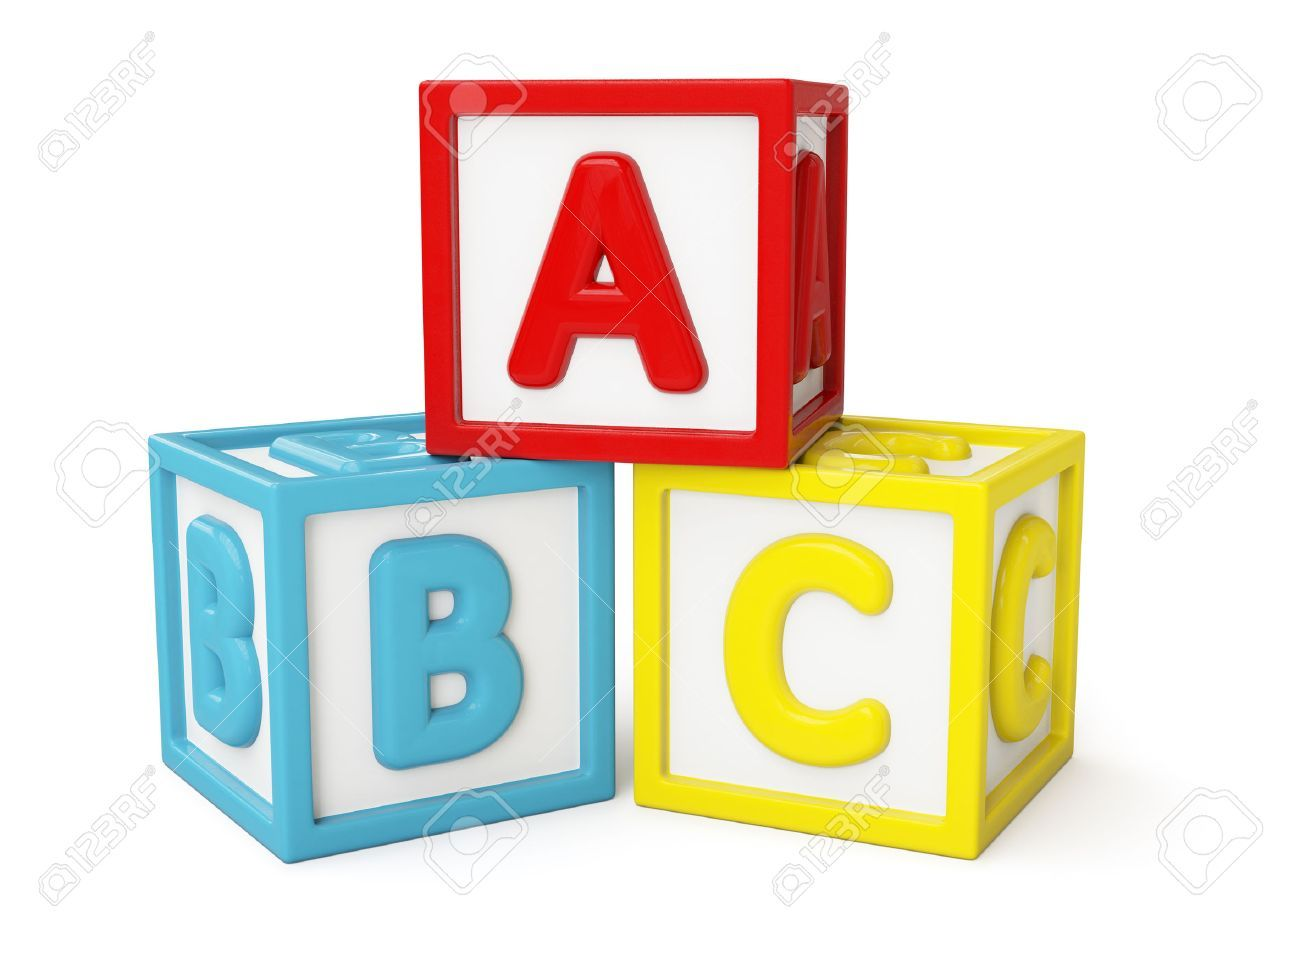 Abc building blocks clipart 3 » Clipart Portal.